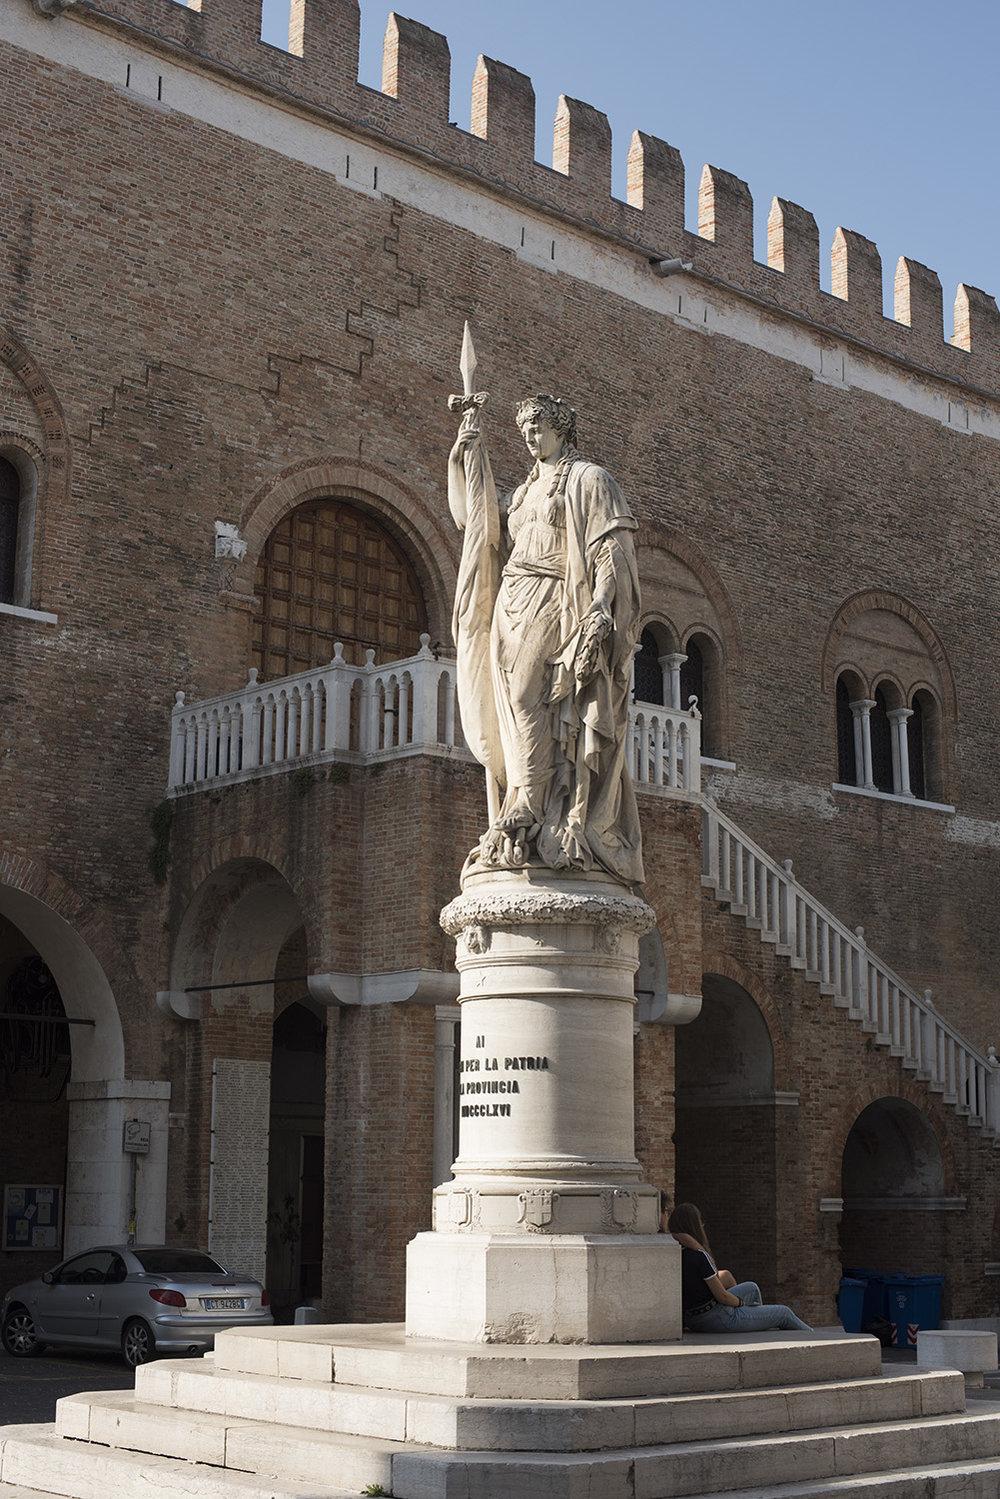 AS17-02080 Teresona - monument, Treviso, Veneto